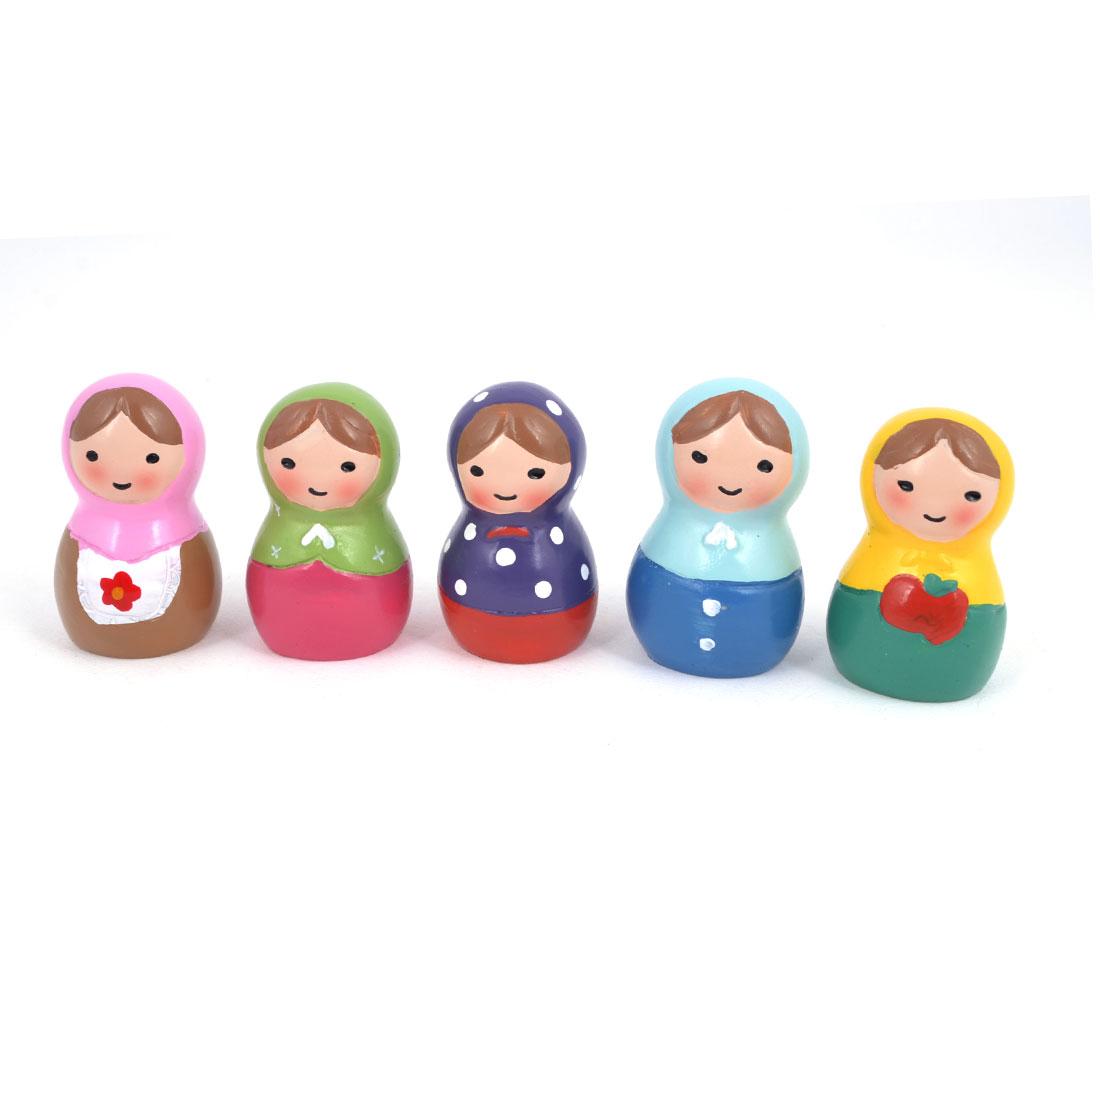 Festival Decoration Colorful Resin Russian Doll Design Model 5.1cm 5 Pcs